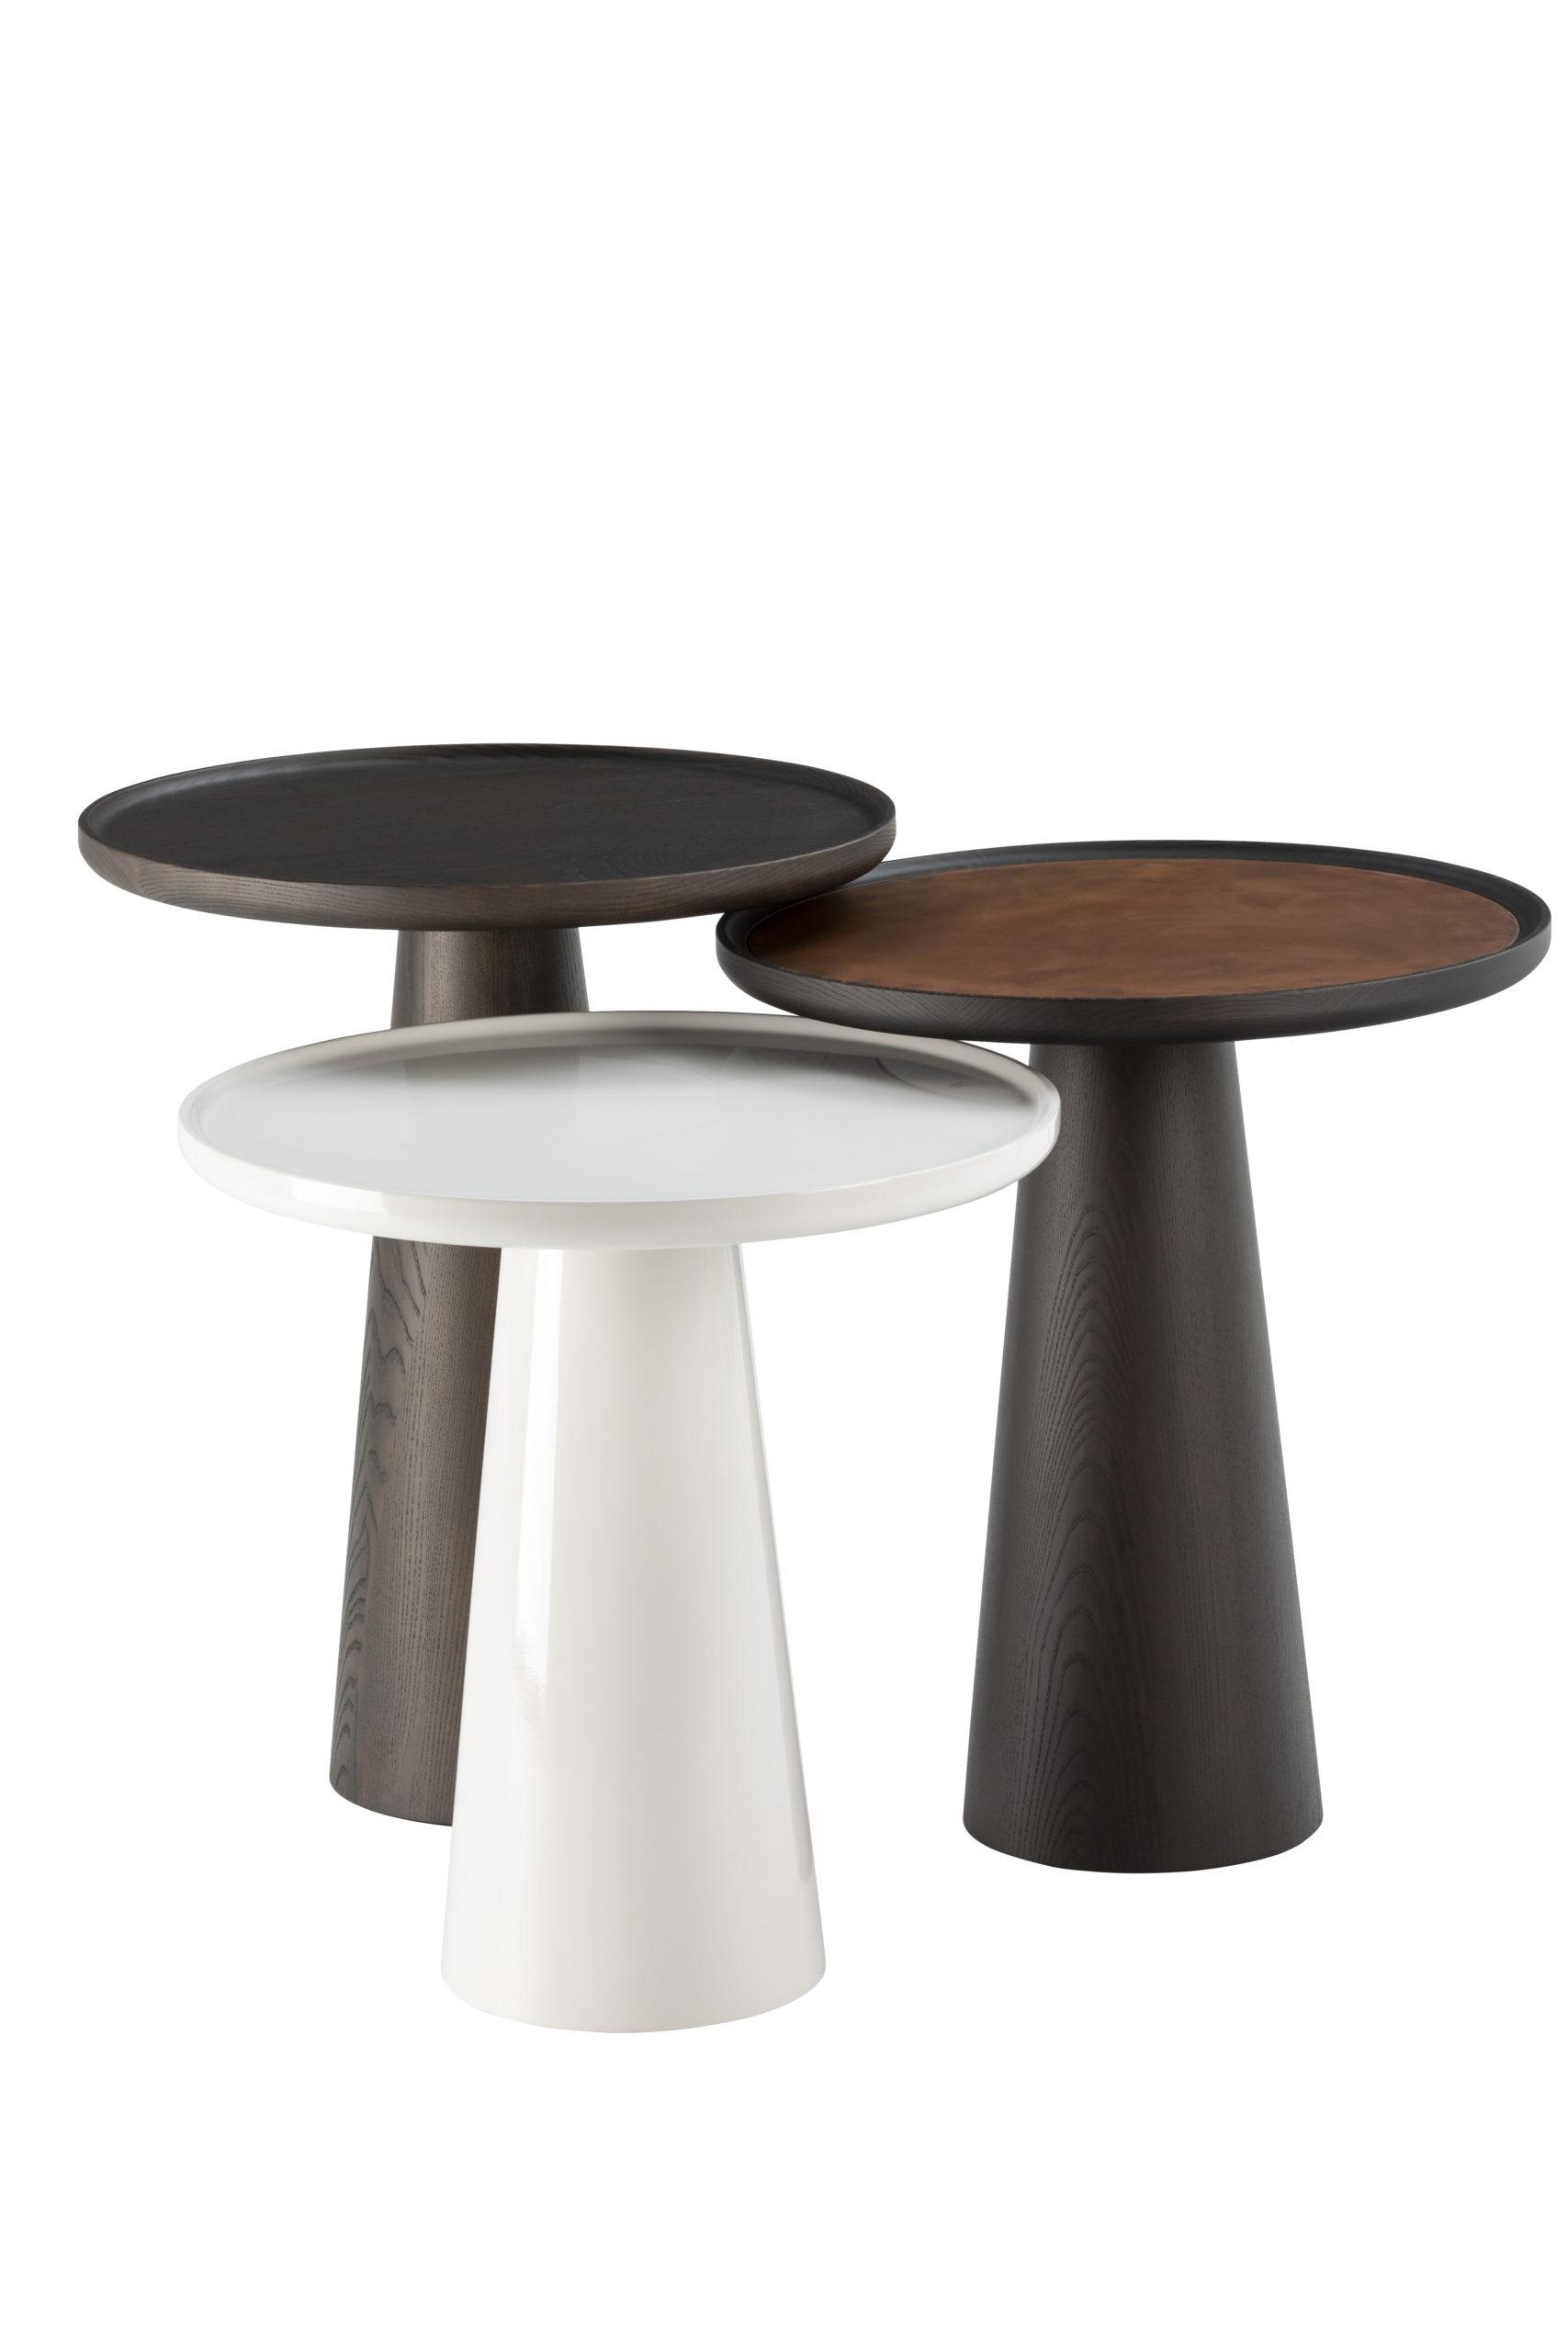 PORTER TABLE photo